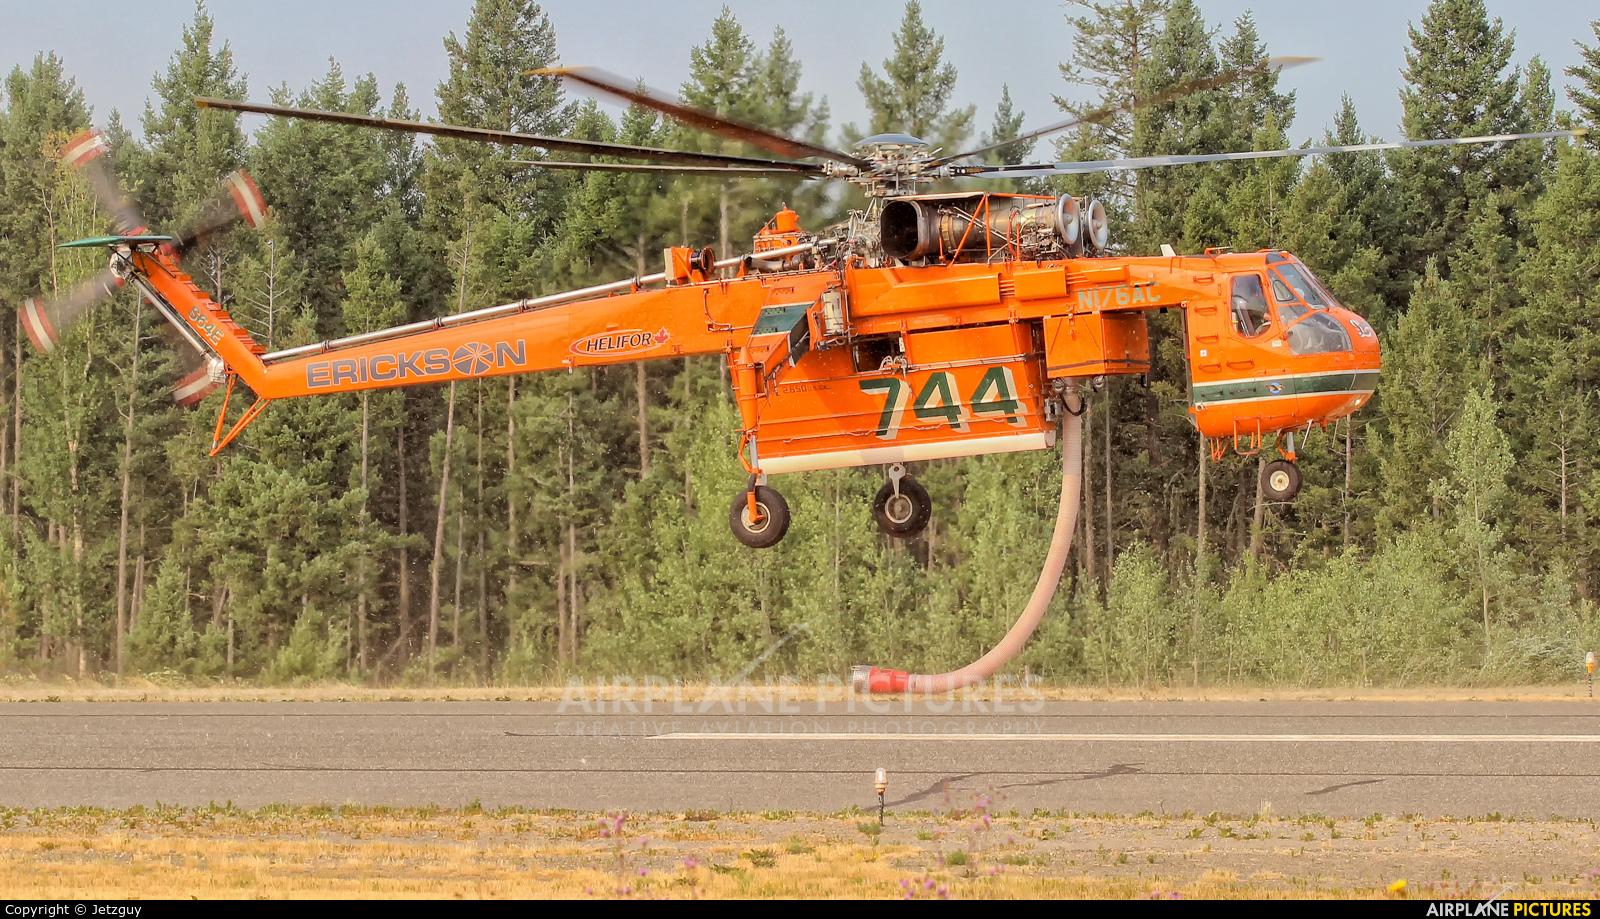 Erickson Air-Crane N176AC aircraft at 108 Mile Ranch, BC